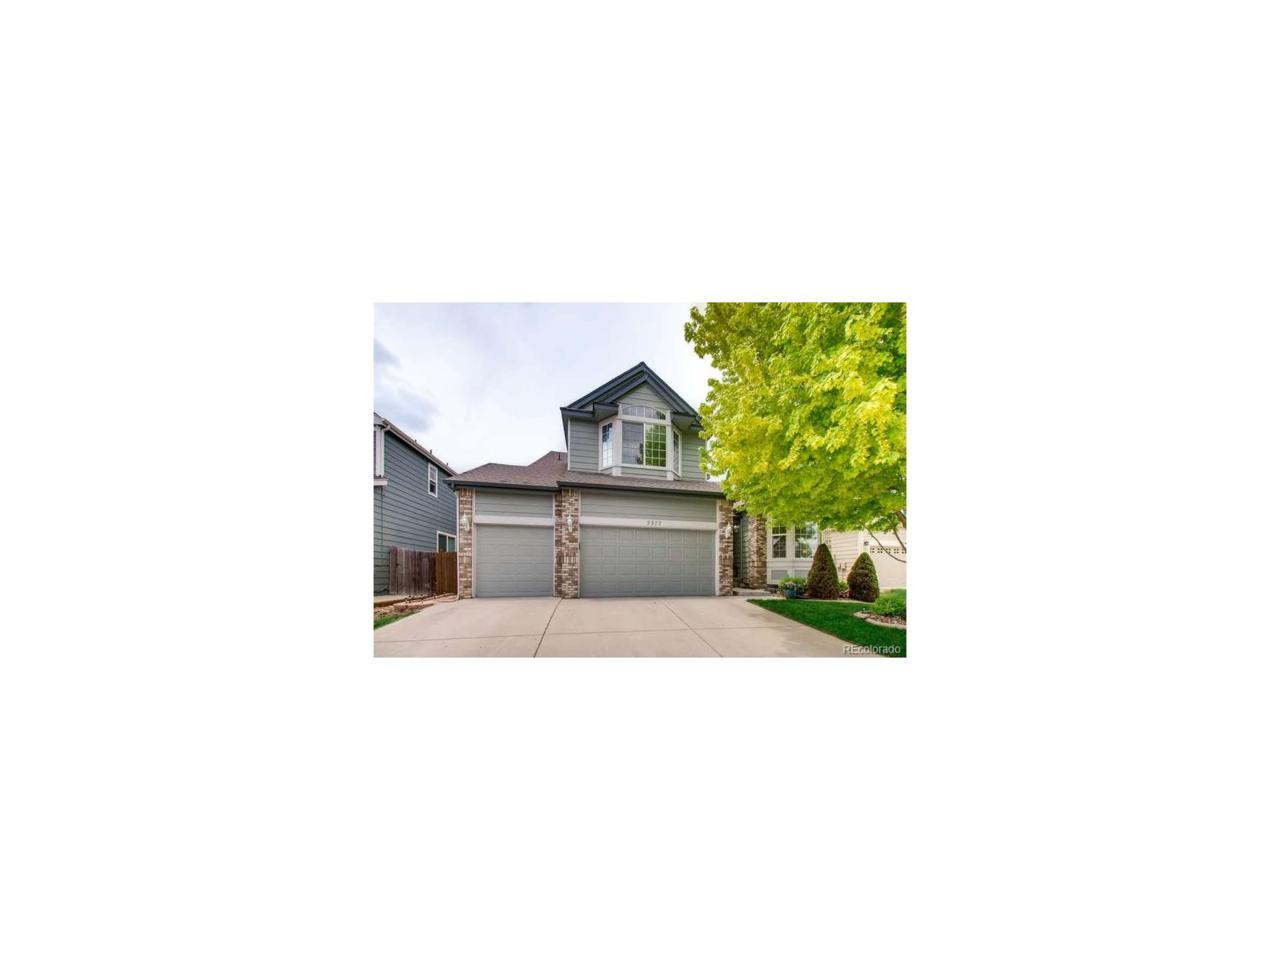 5977 Scenic Avenue, Firestone, CO 80504 (MLS #7291253) :: 8z Real Estate